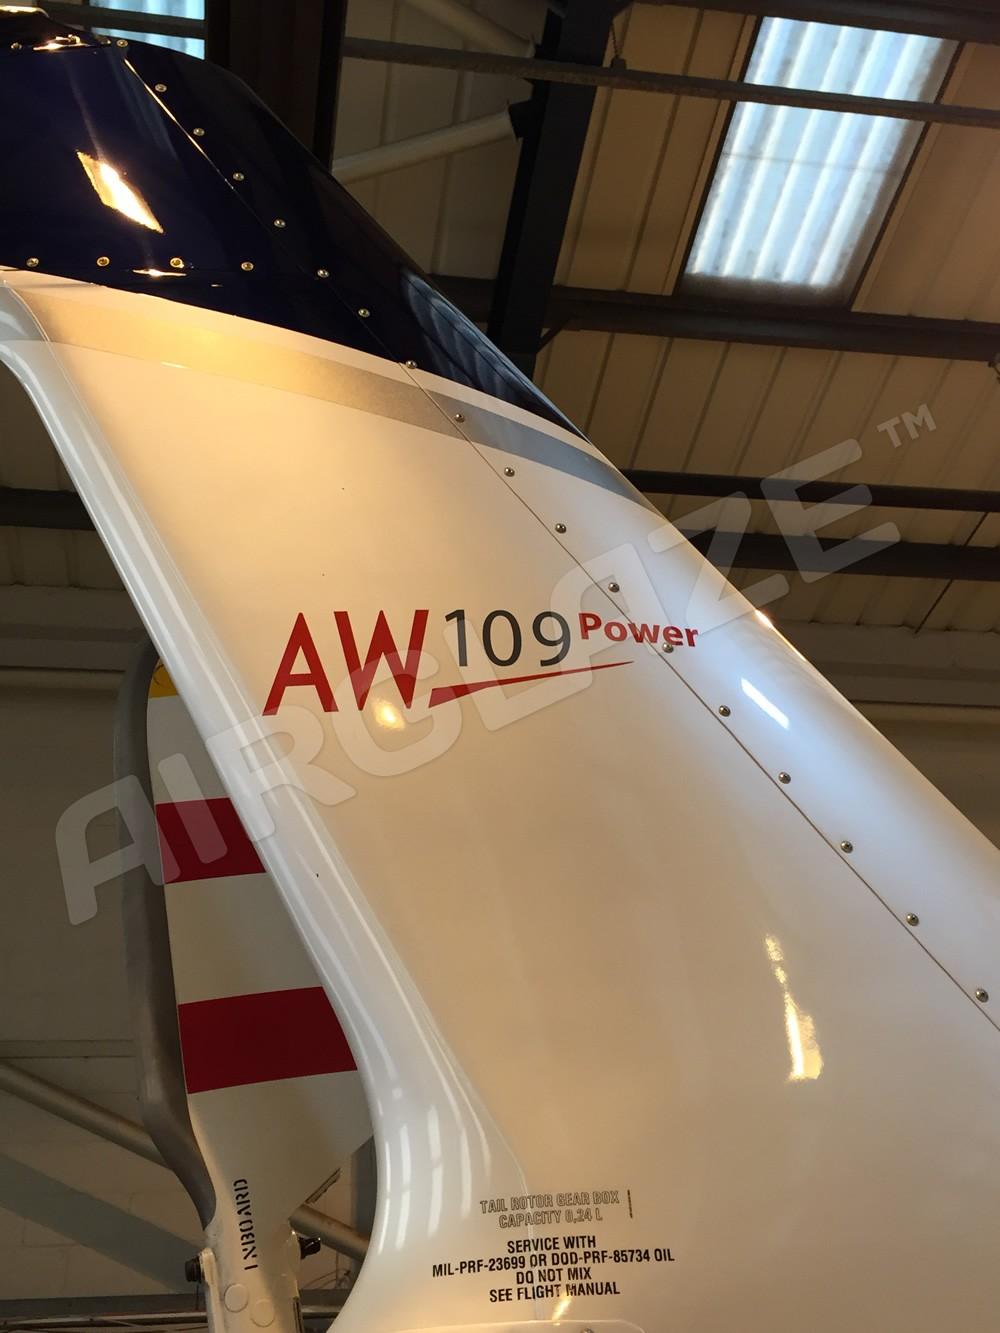 AW109